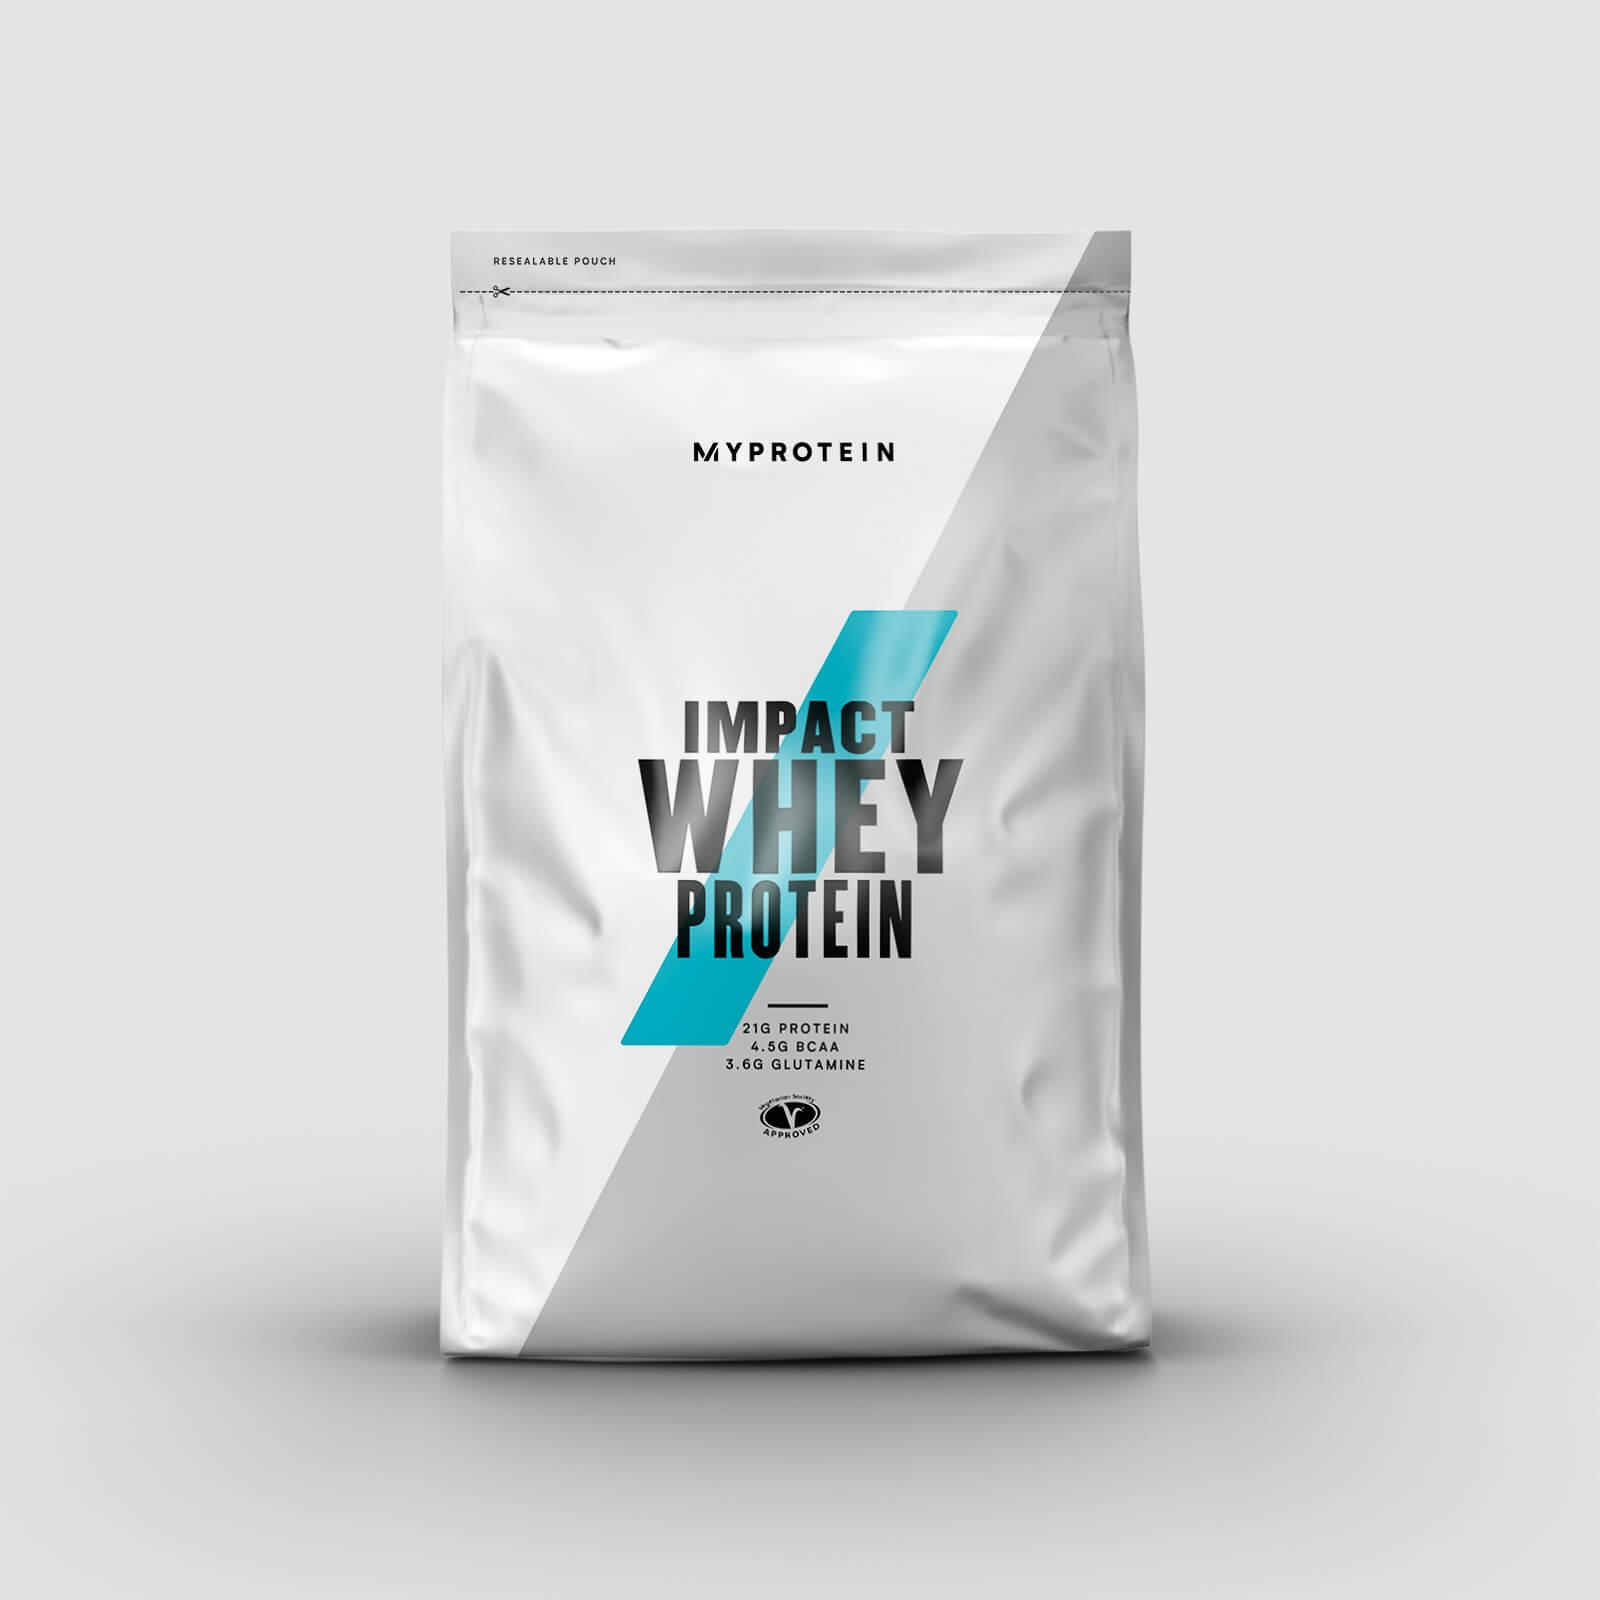 impact whey protein mp